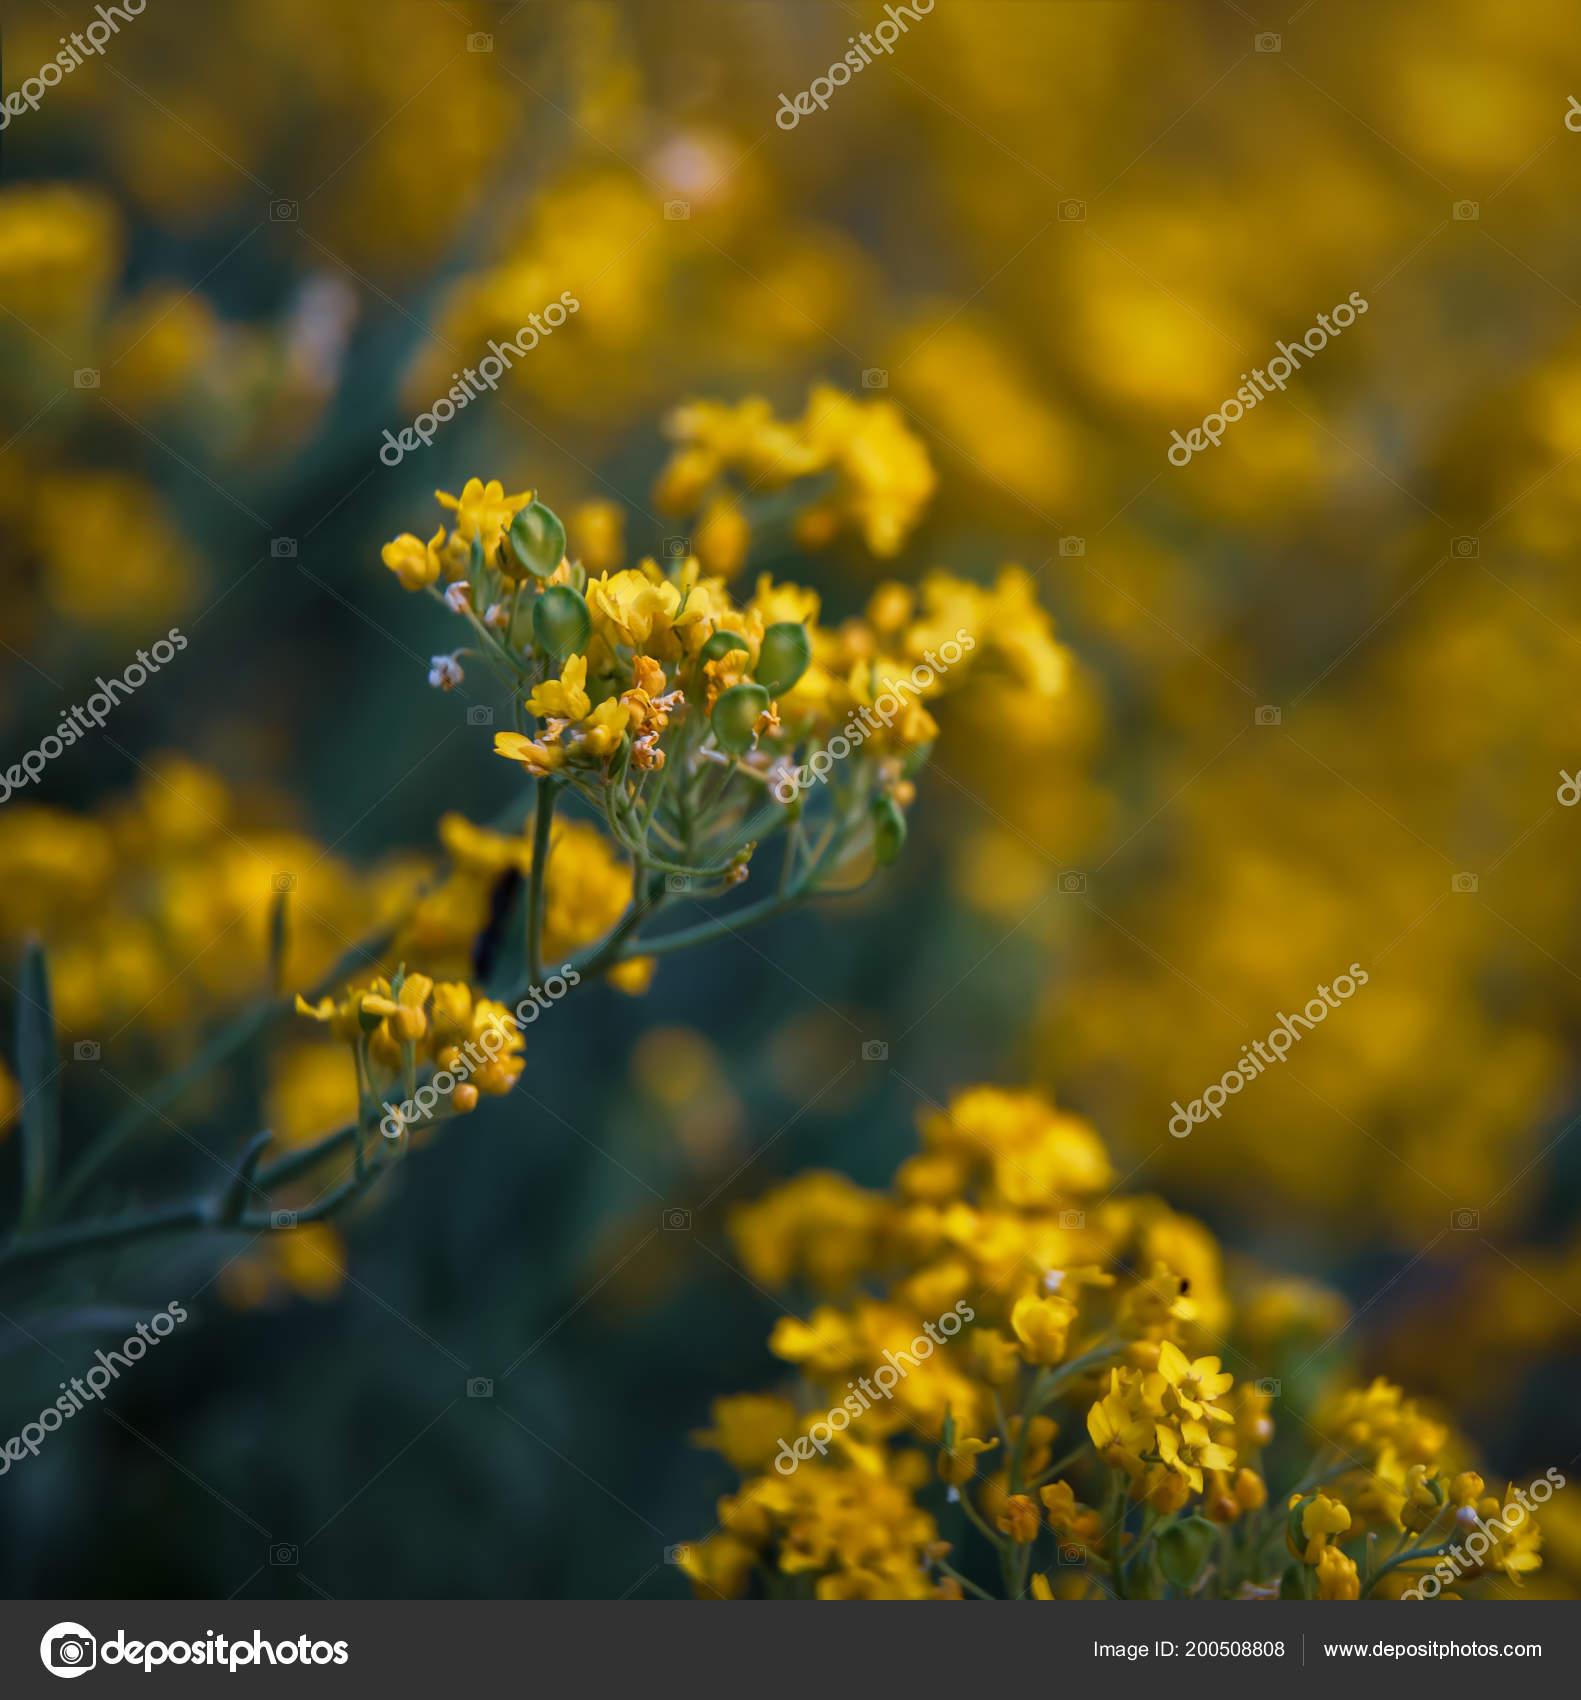 Soft Focus Image Small Yellow Flowers Aurinia Saxatilis Spring Time